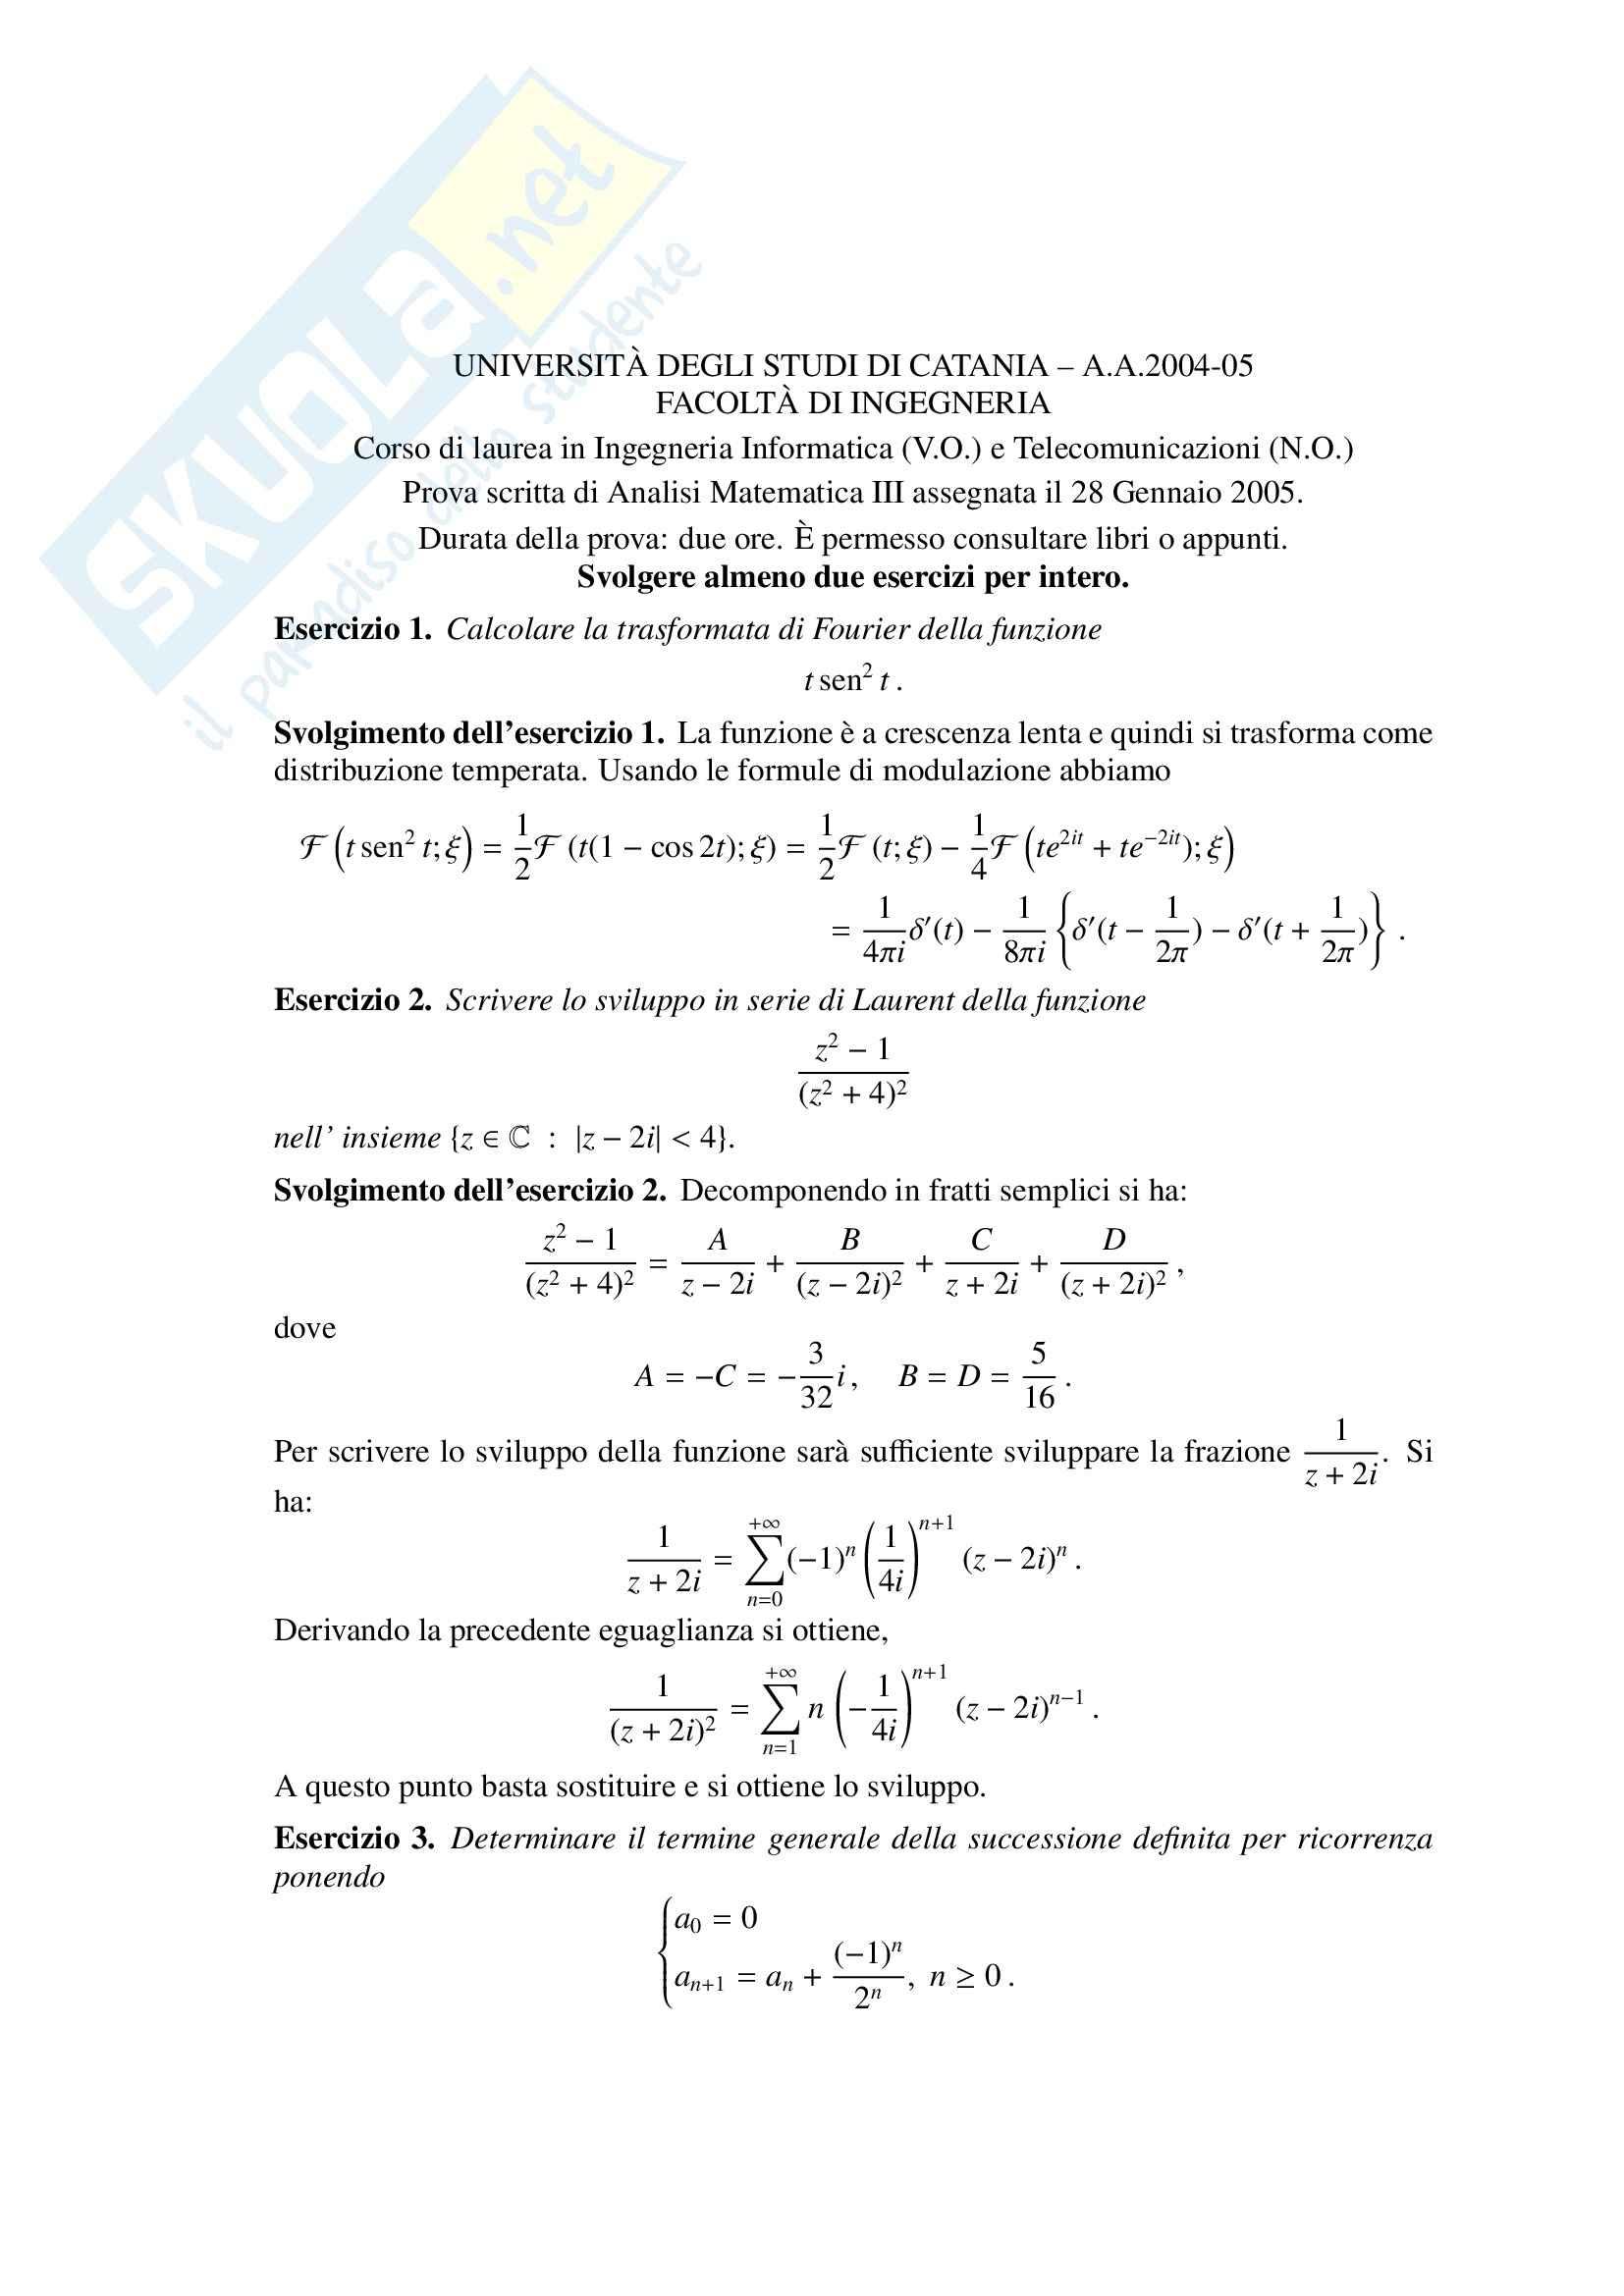 Analisi Matematica III - prova scritta